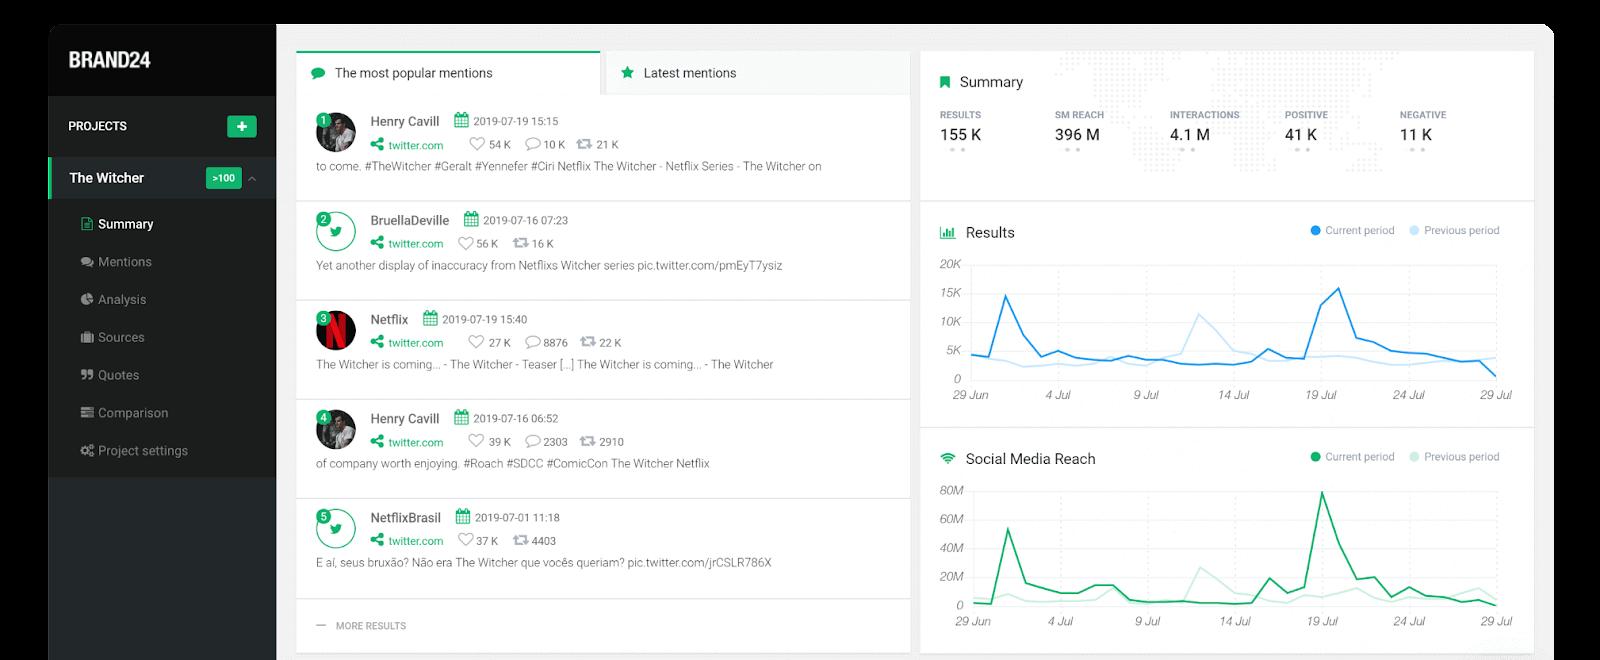 a screenshot of brand24, a social media monitoring tool